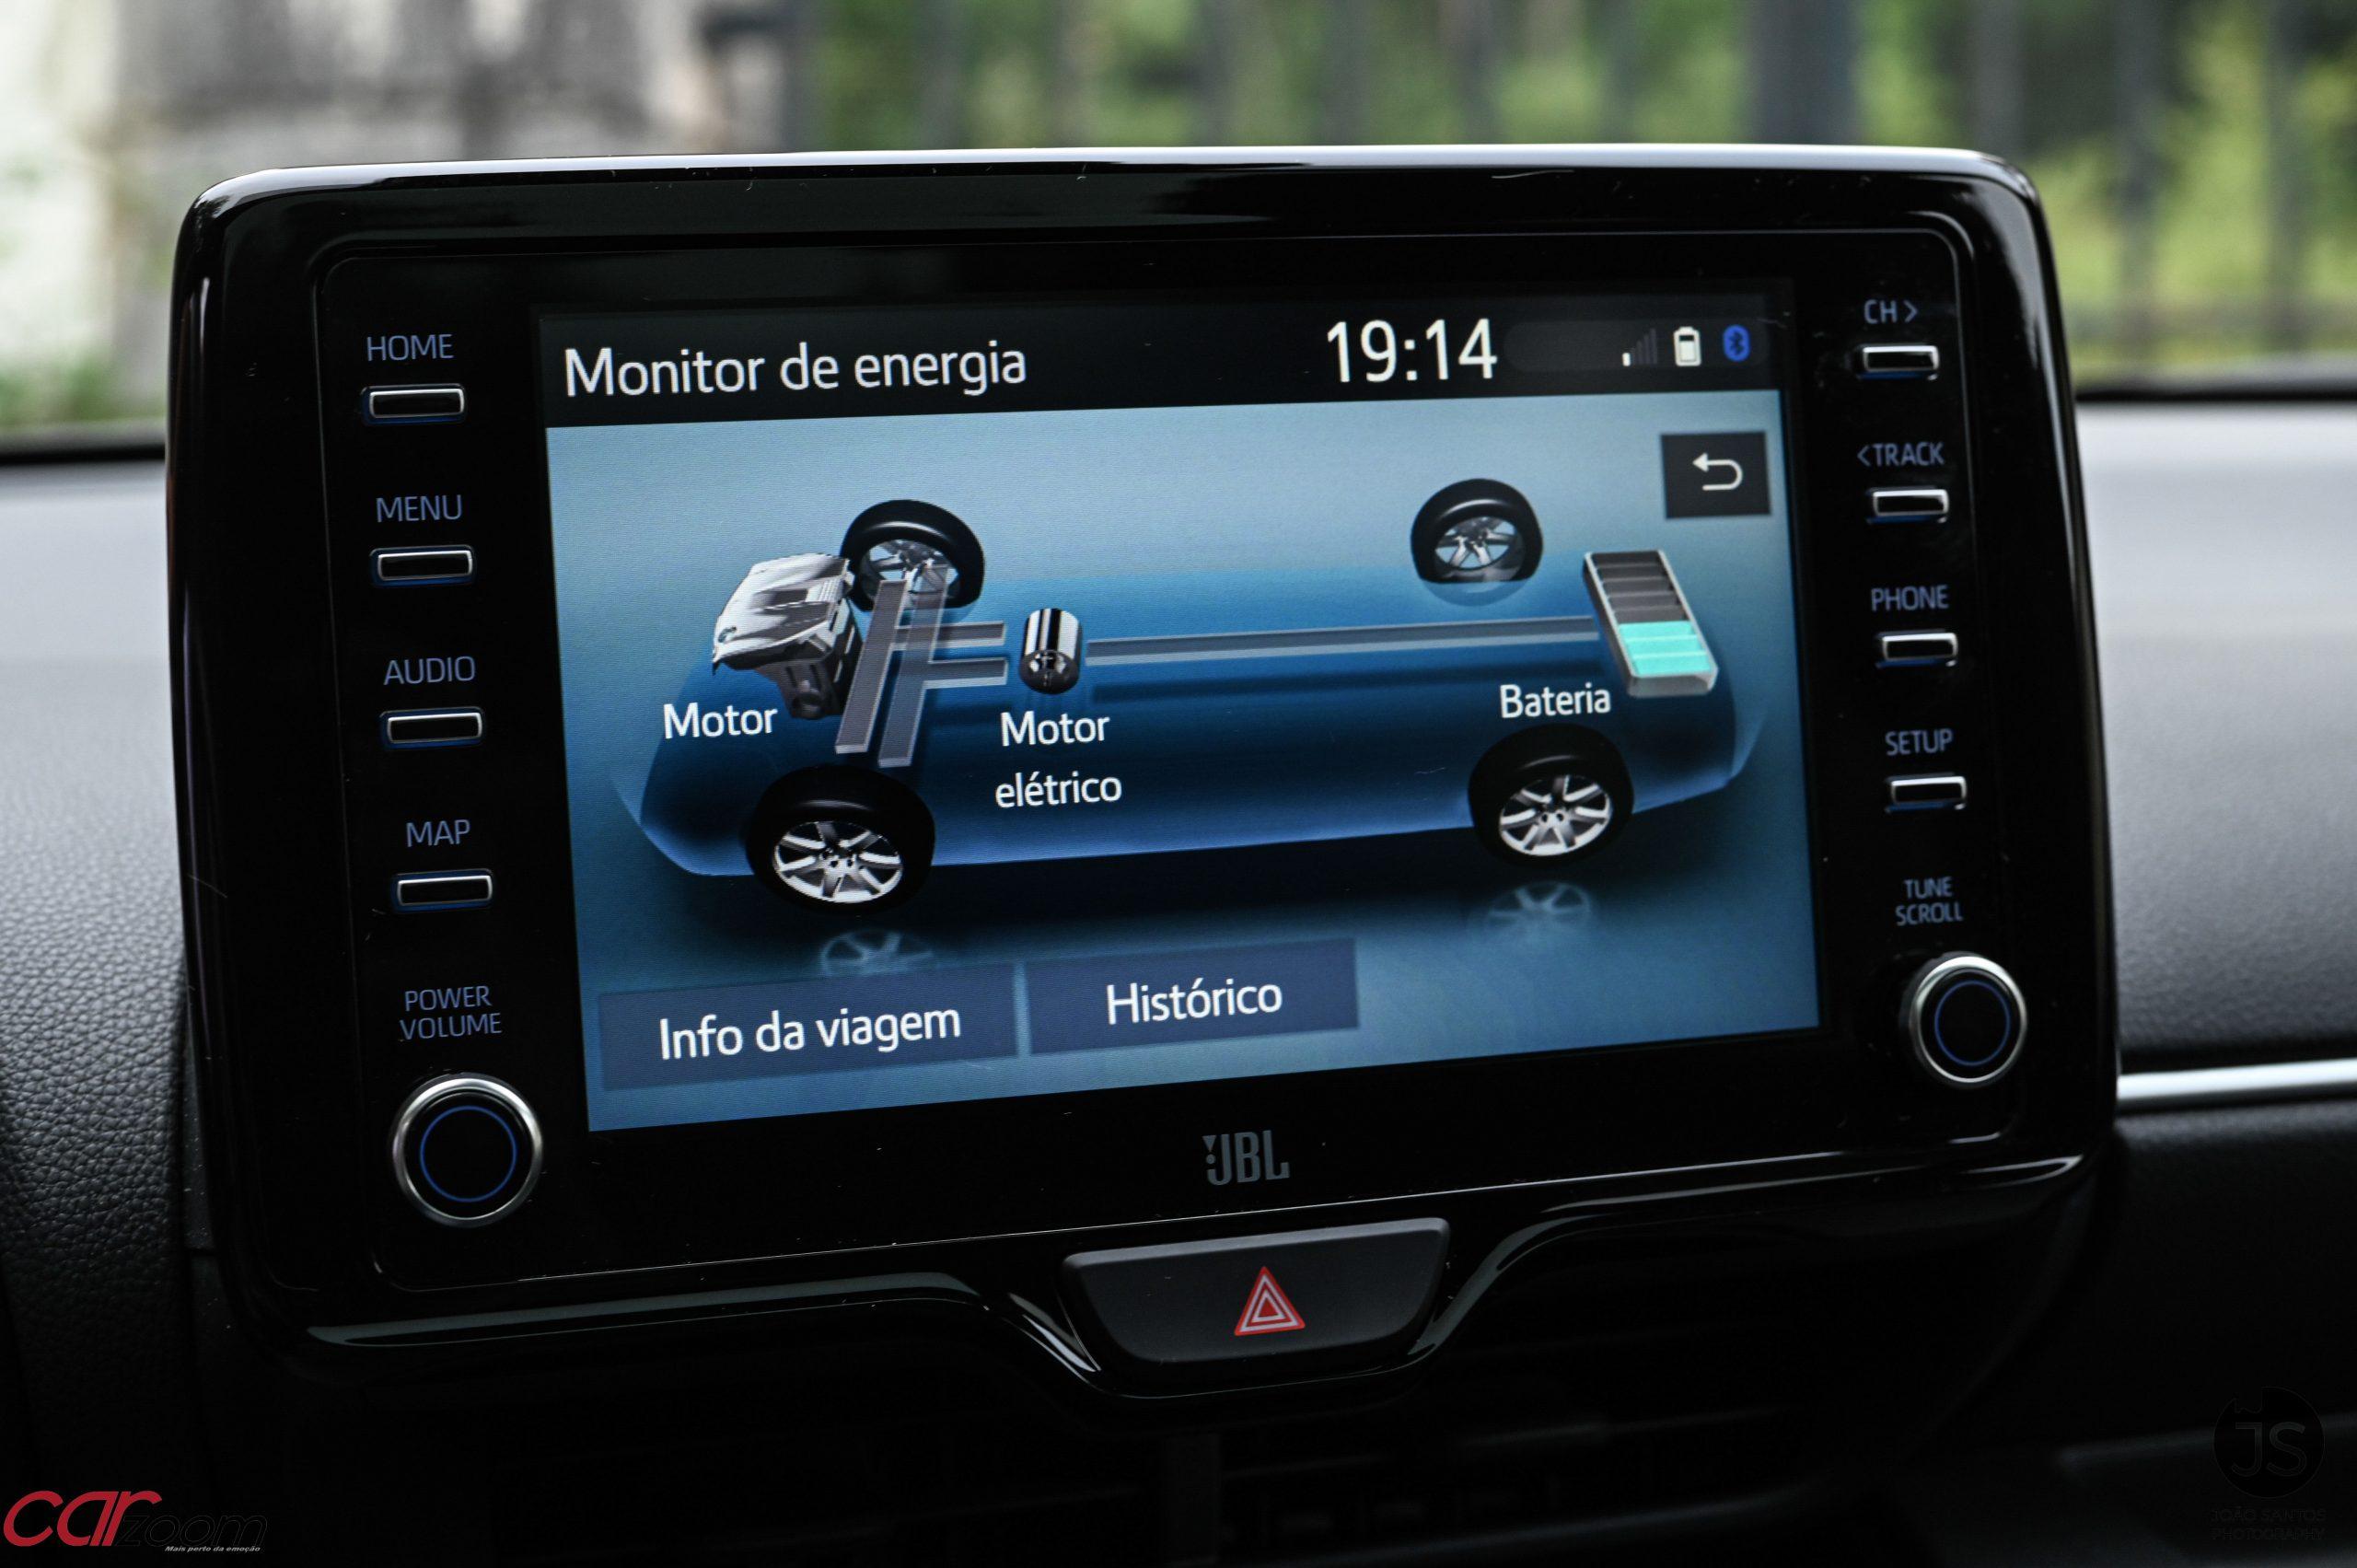 TOYOTA YARIS PREMIER EDITION 1.5 Hybrid: Um híbrido com alma! 25